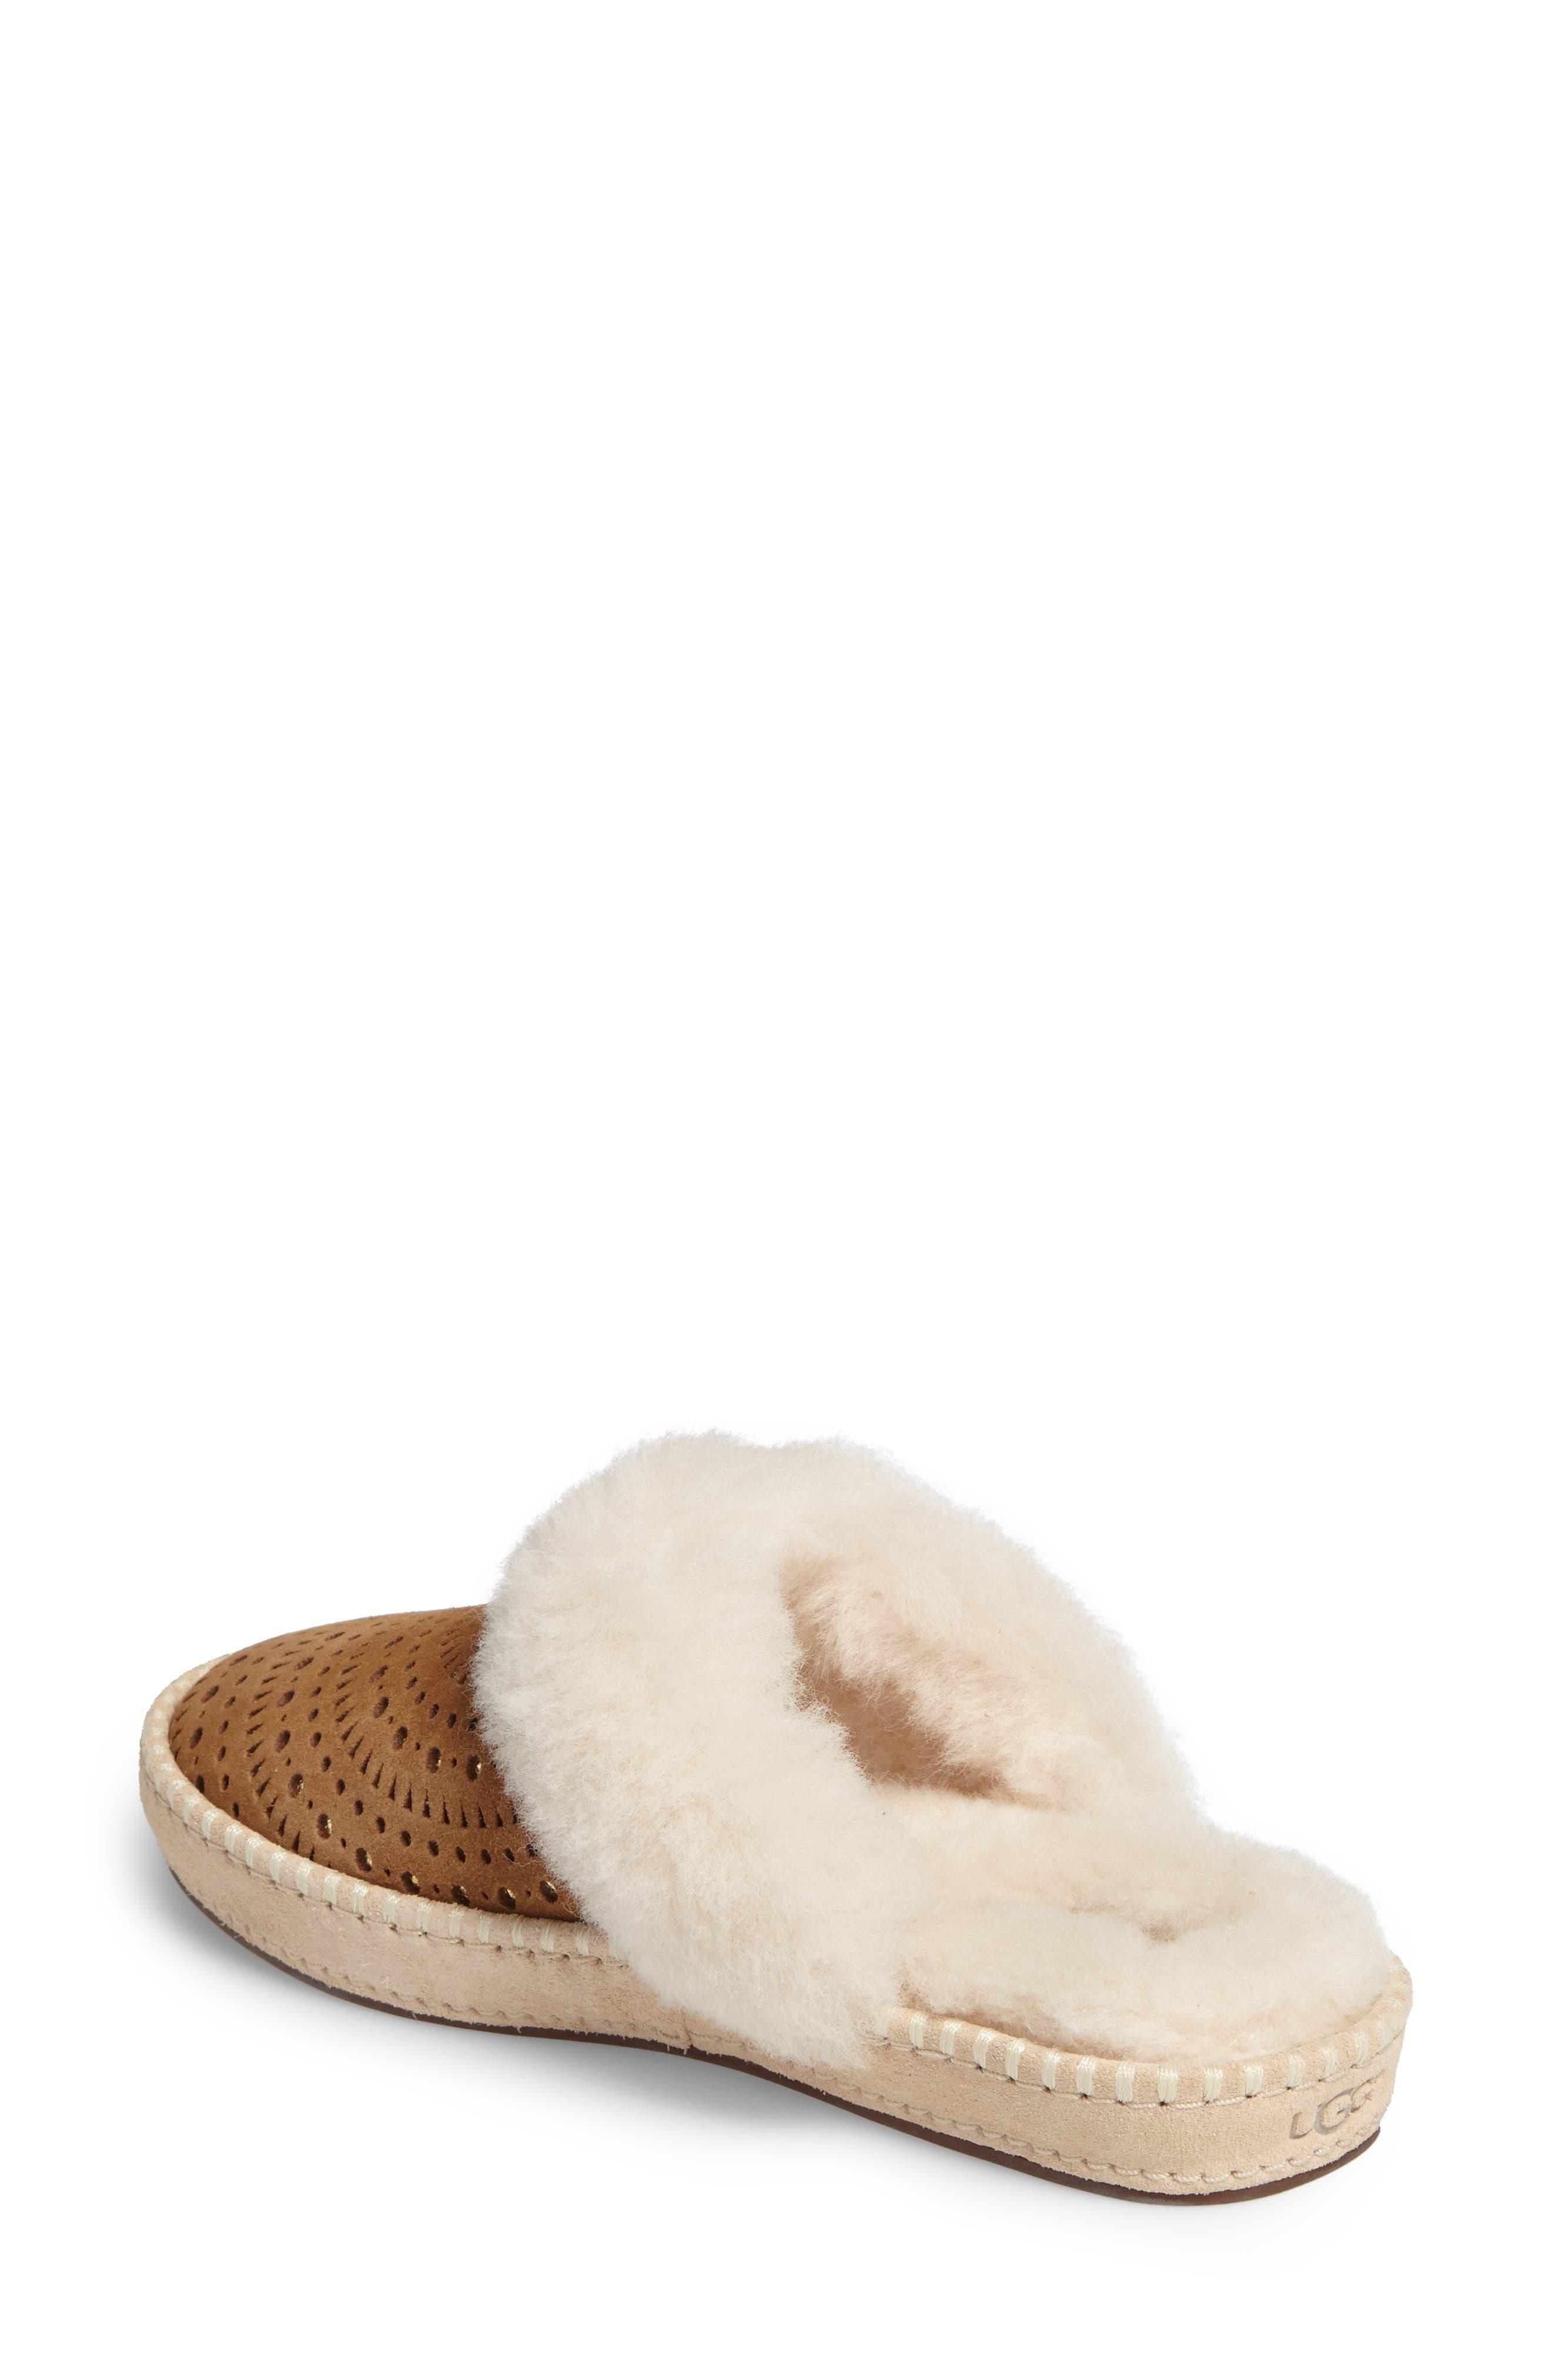 Aira Sunshine Genuine Shearling Slipper,                             Alternate thumbnail 3, color,                             Chestnut Suede